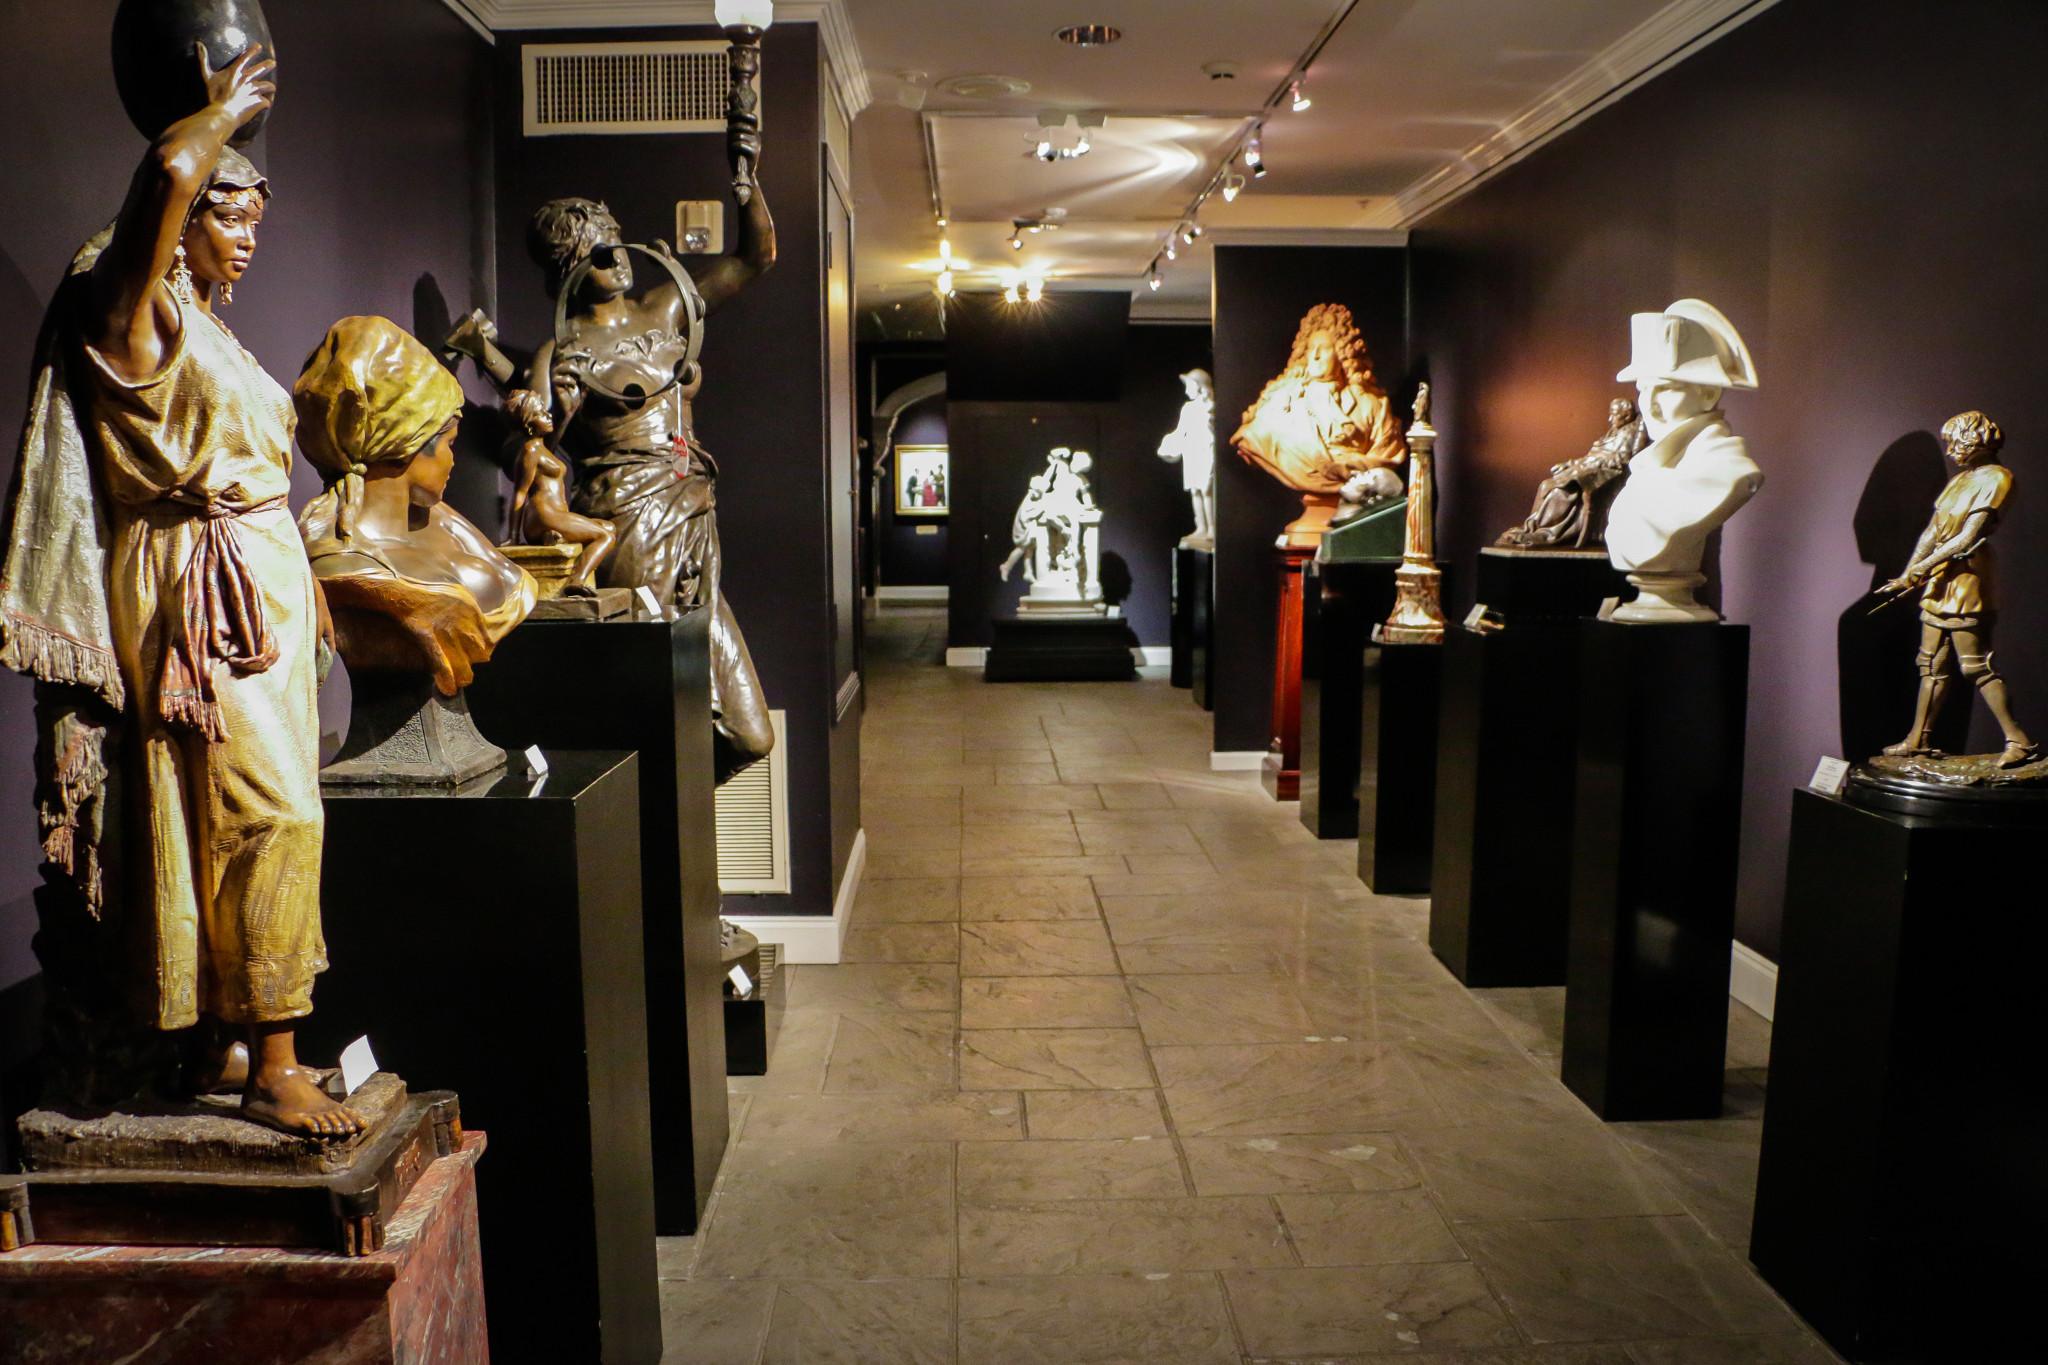 Part of the secret room inside M.S. Rau Antiques. (Photo: Rebecca Ratliff)